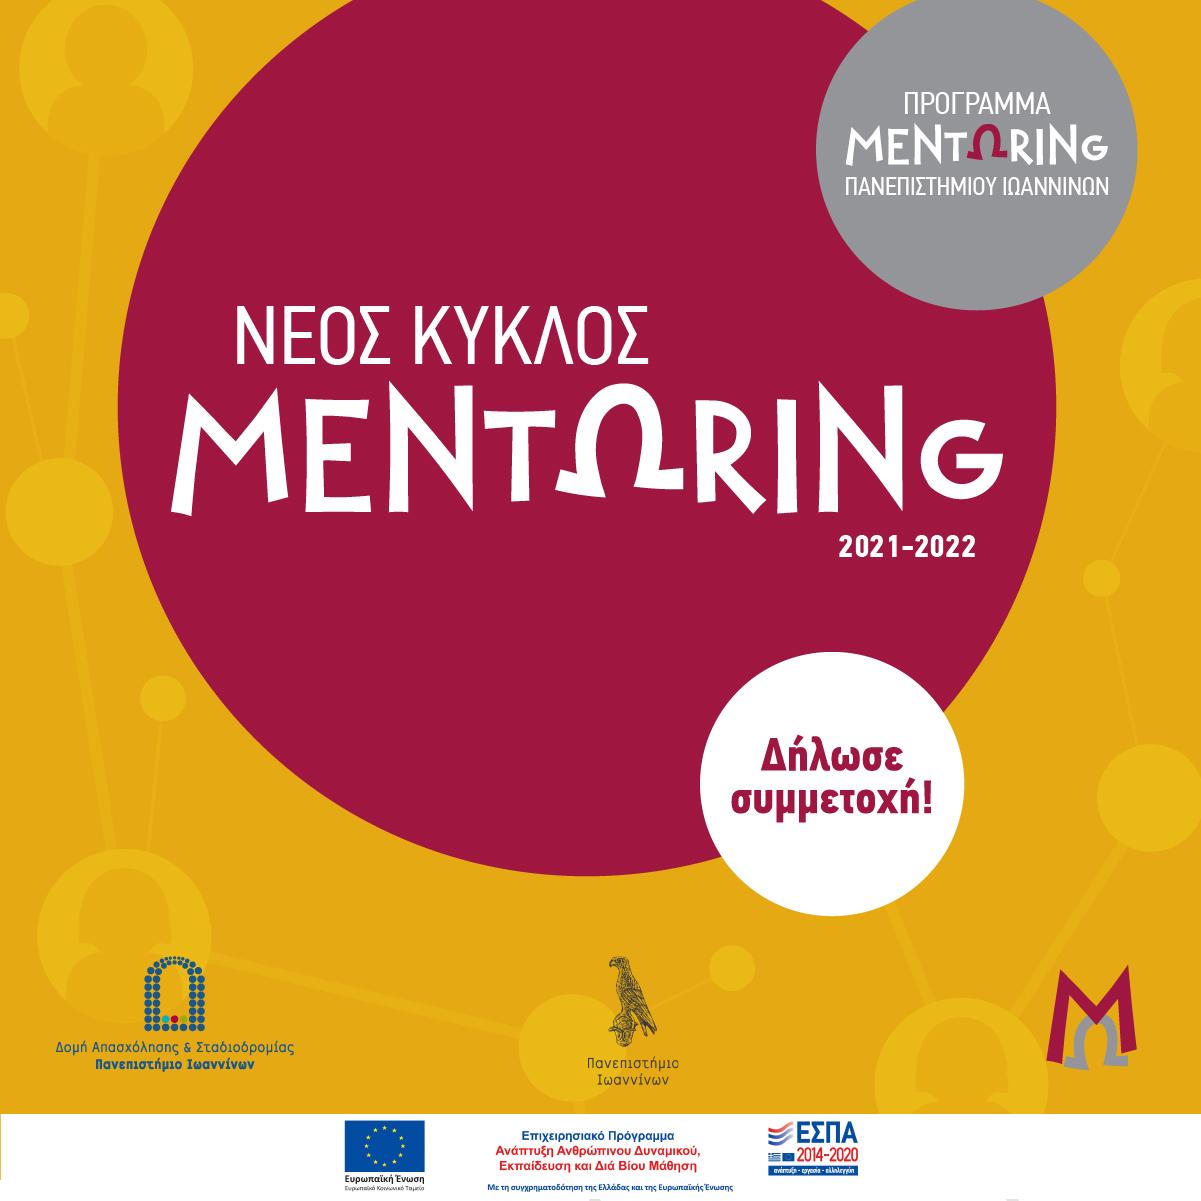 UoI-Mentoring-Program-2021-2022